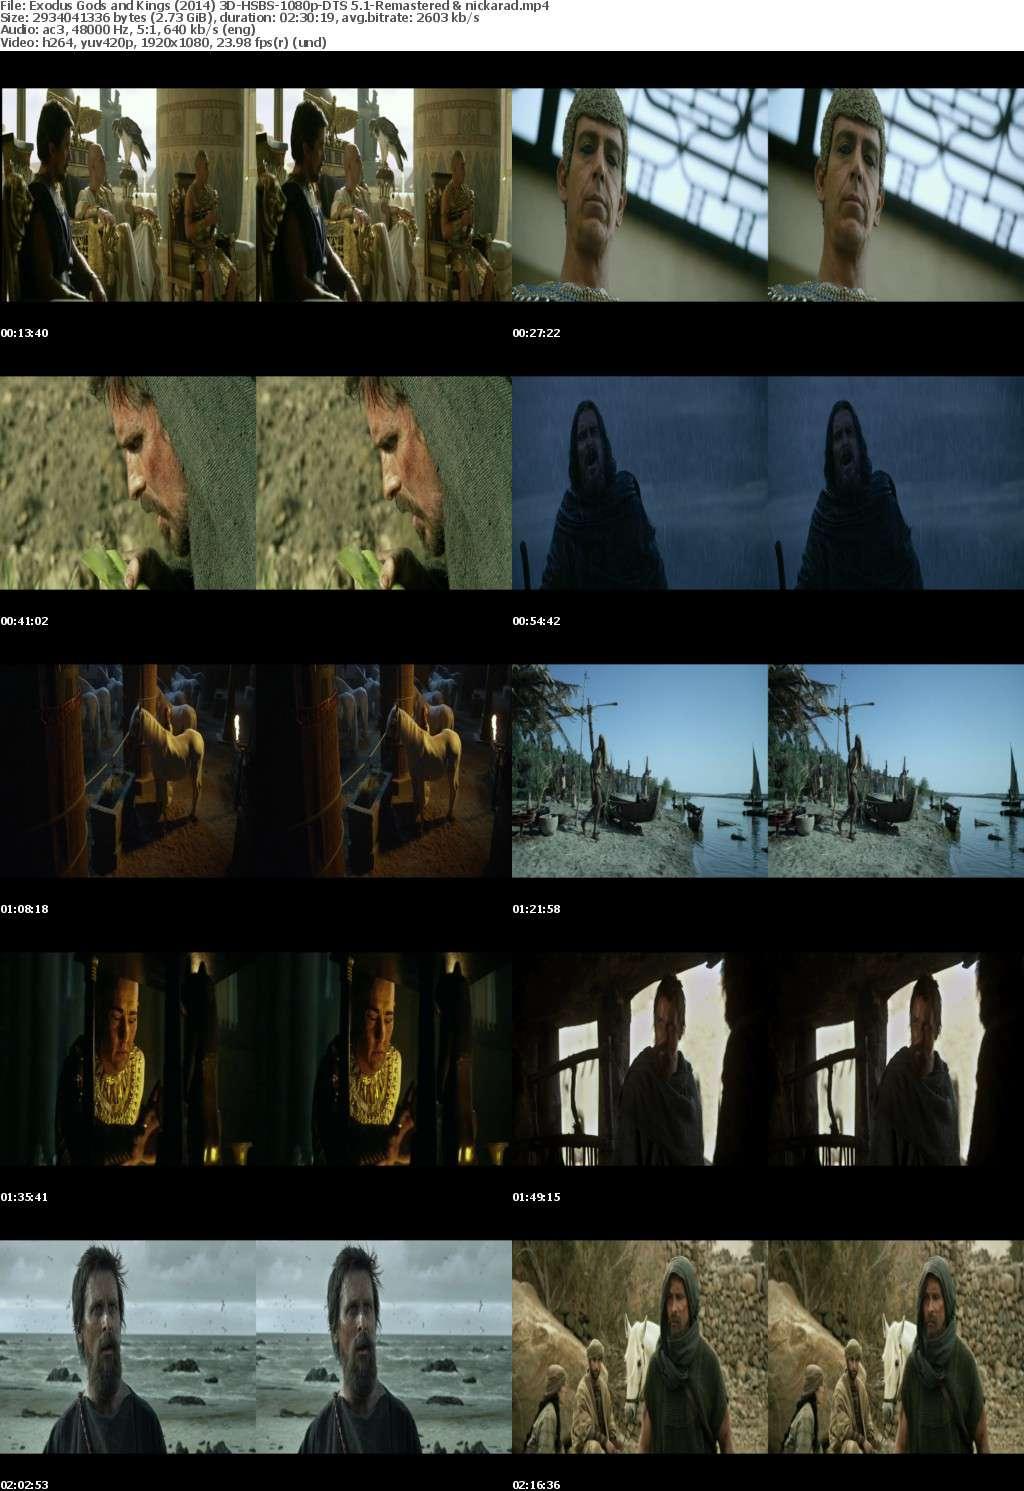 Exodus Gods and Kings (2014) 3D HSBS 1080p BluRay AC3 (DTS 5.1) Remastered-nickarad